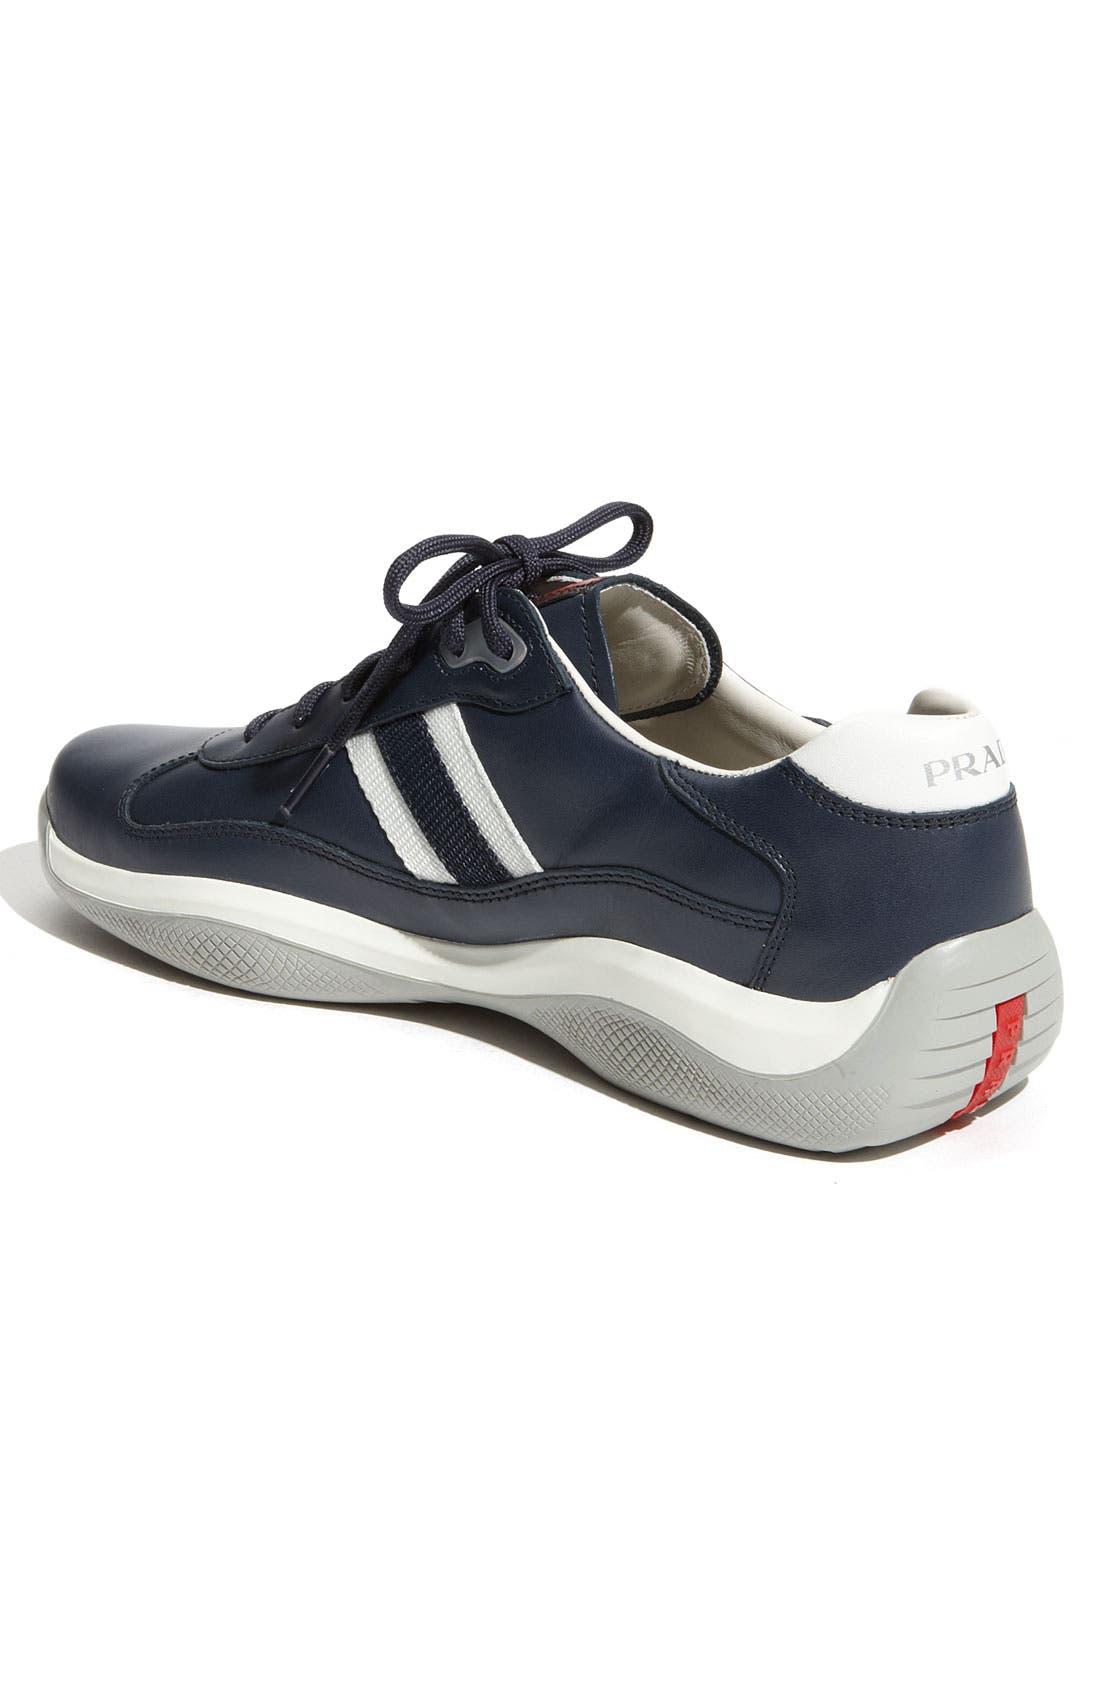 Alternate Image 2  - Prada 'Eagle' Lace-Up Sneaker (Men)